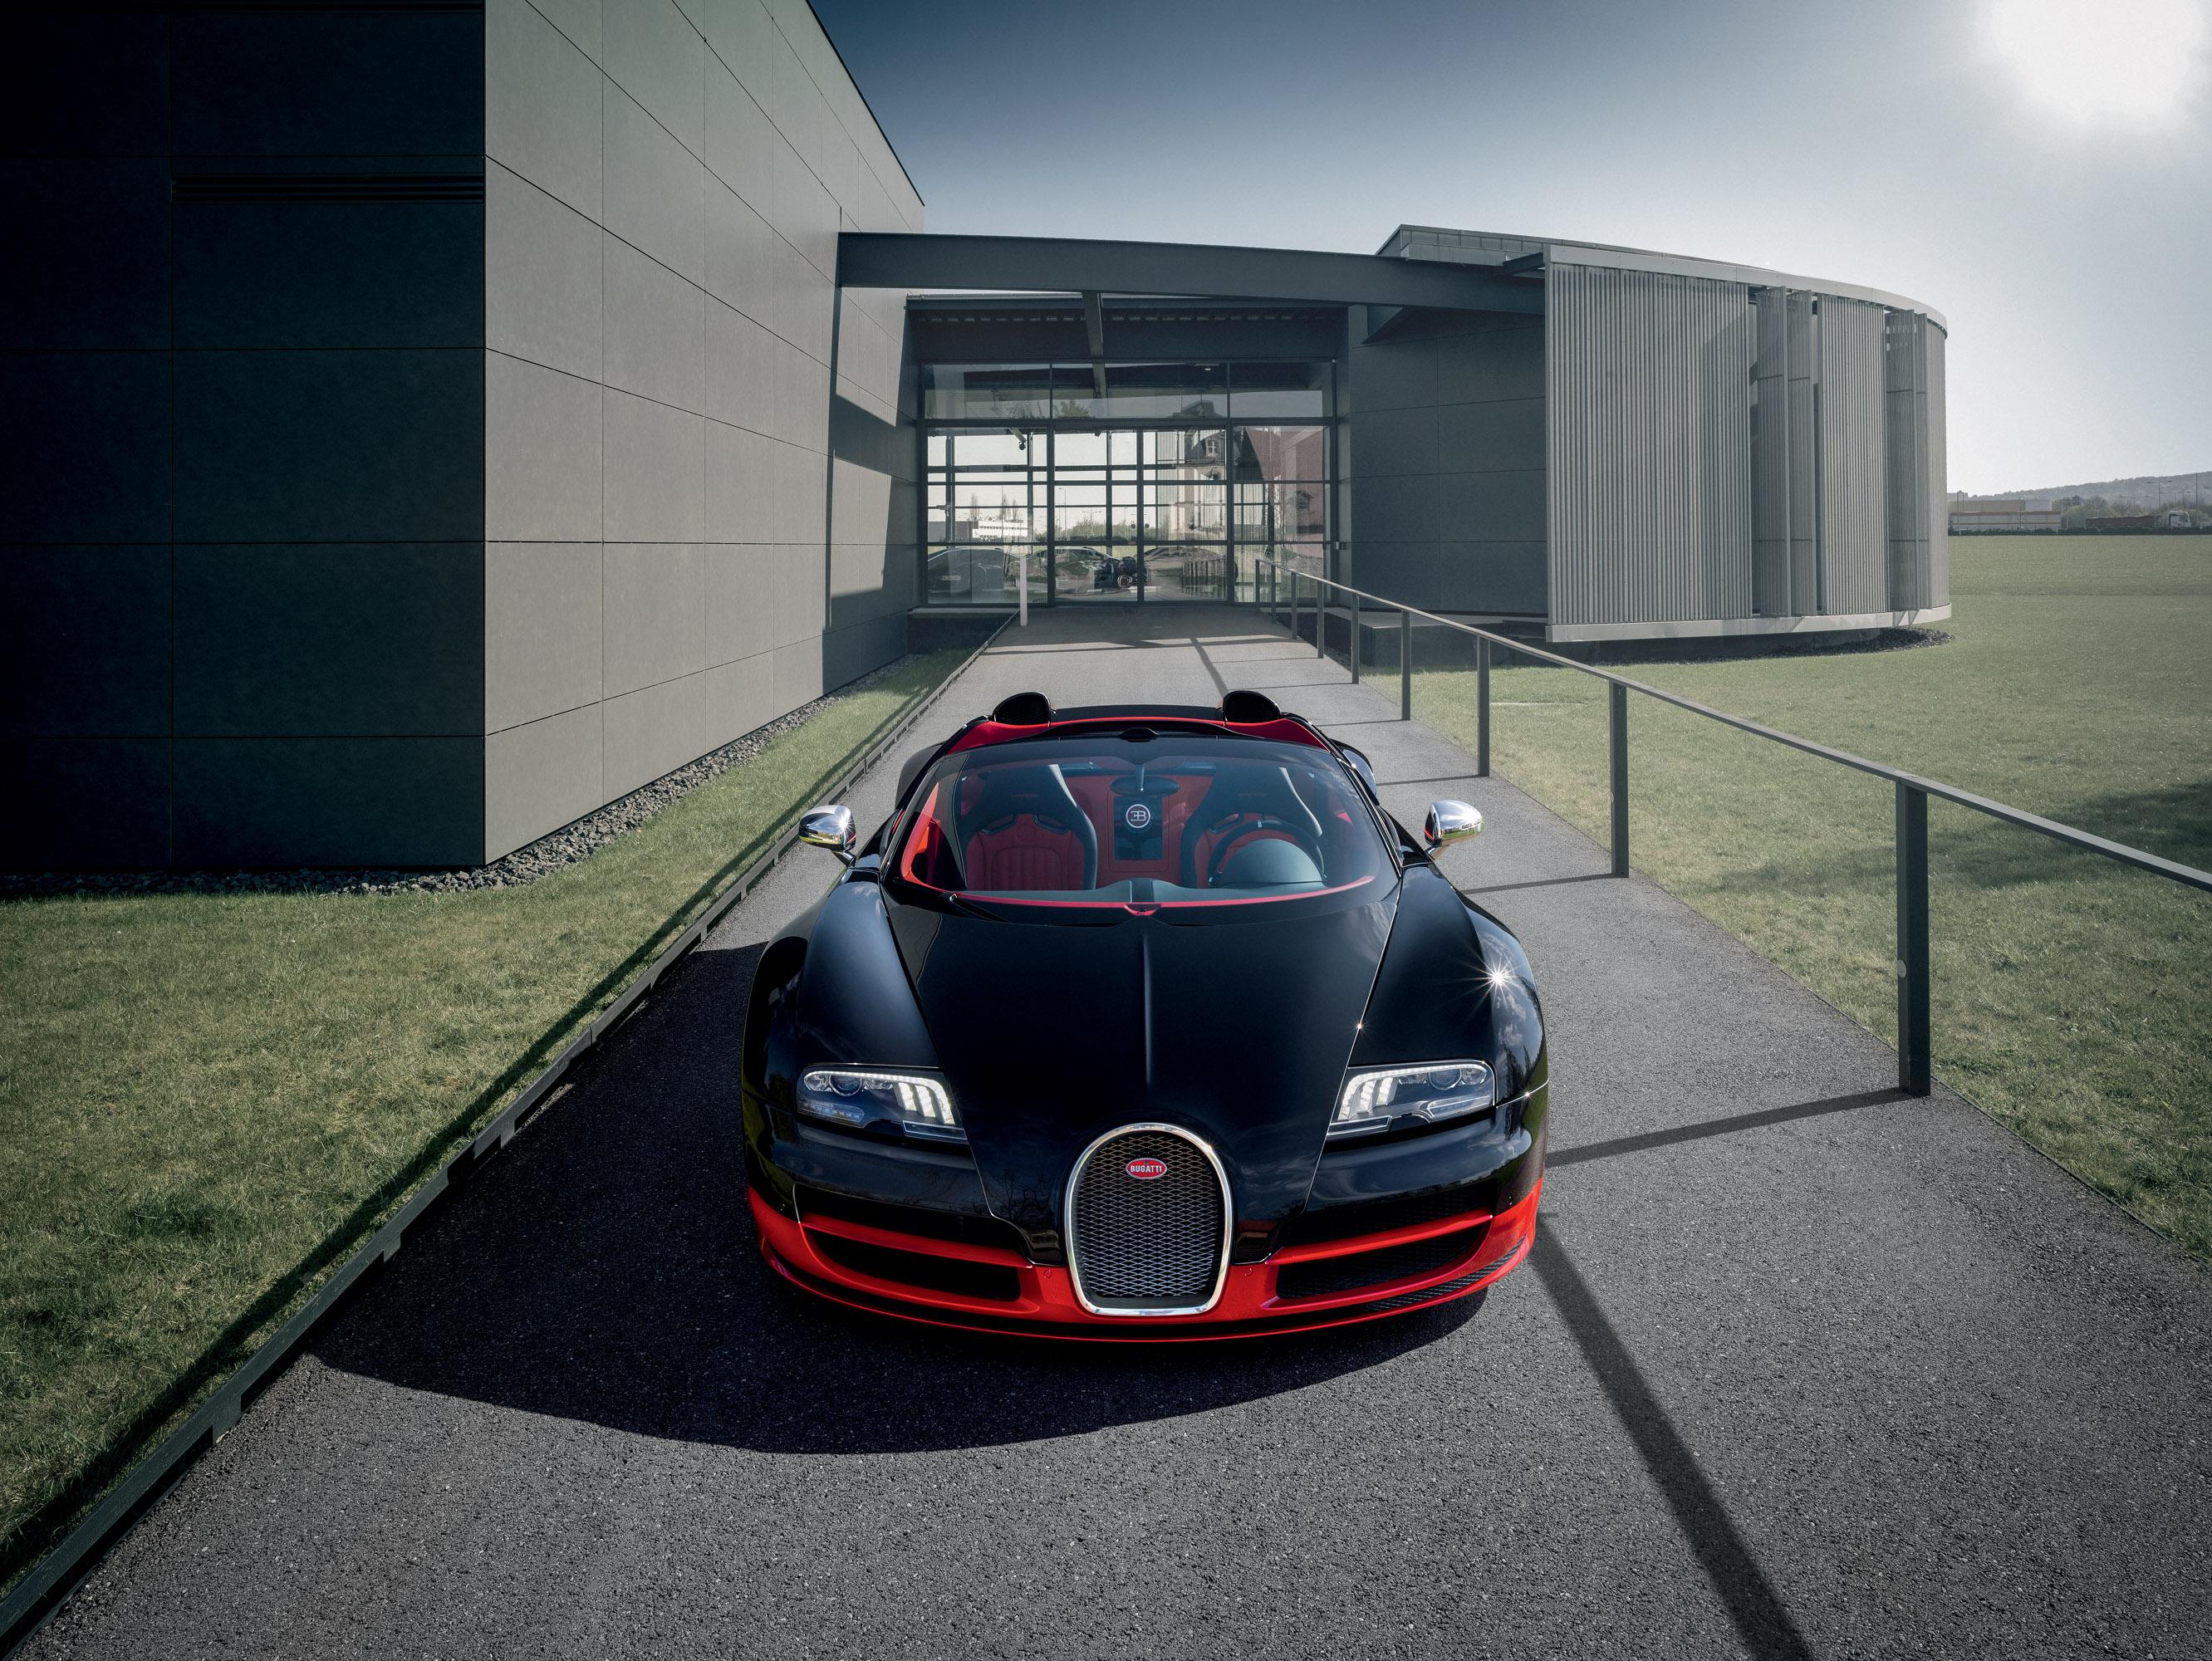 bugatti-veyron-164-grand-sport-vitesse-roadster-01 Amazing Bugatti Veyron Price In Egypt Cars Trend